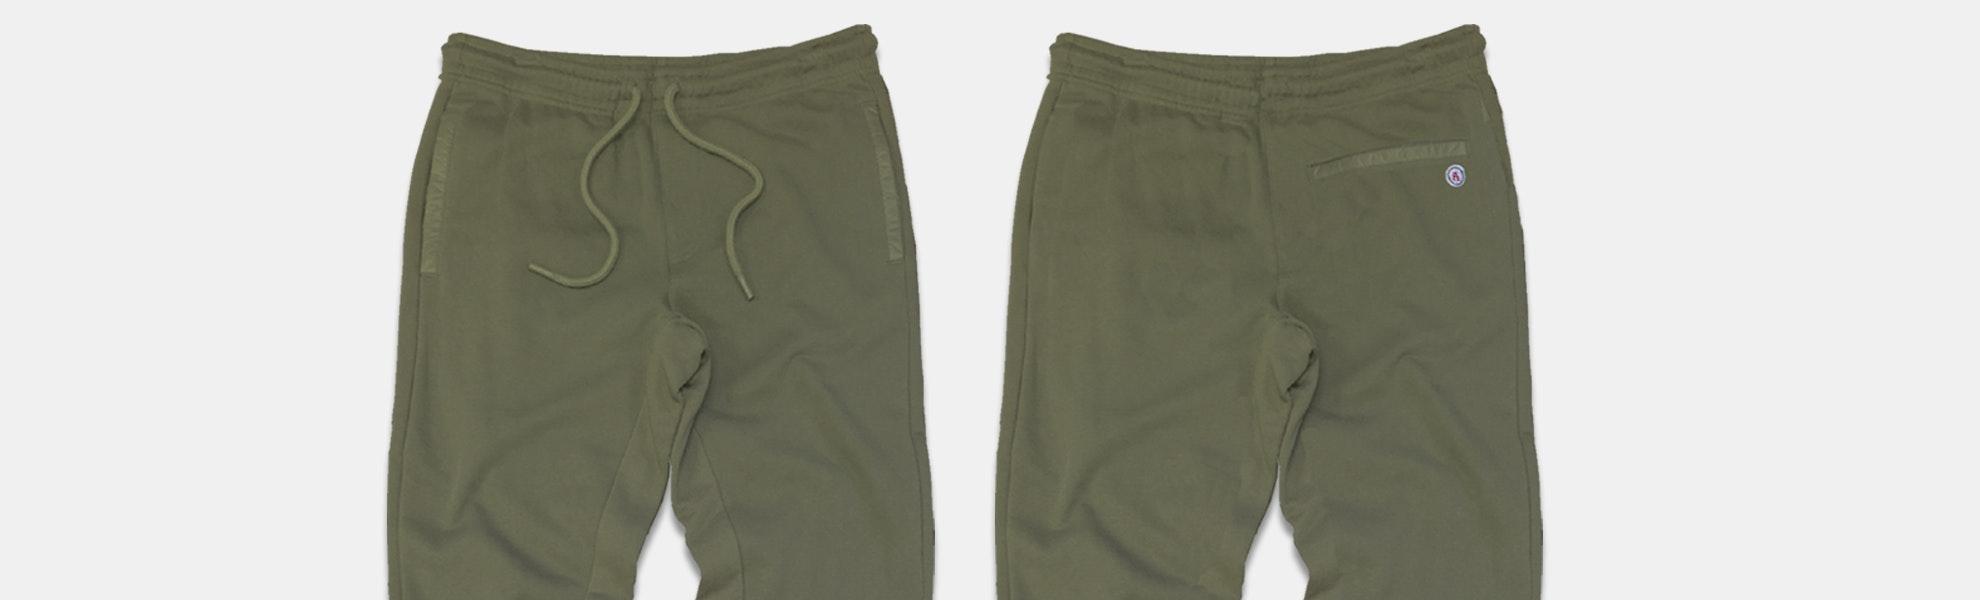 P.A.C. Weekender Pants & Shorts